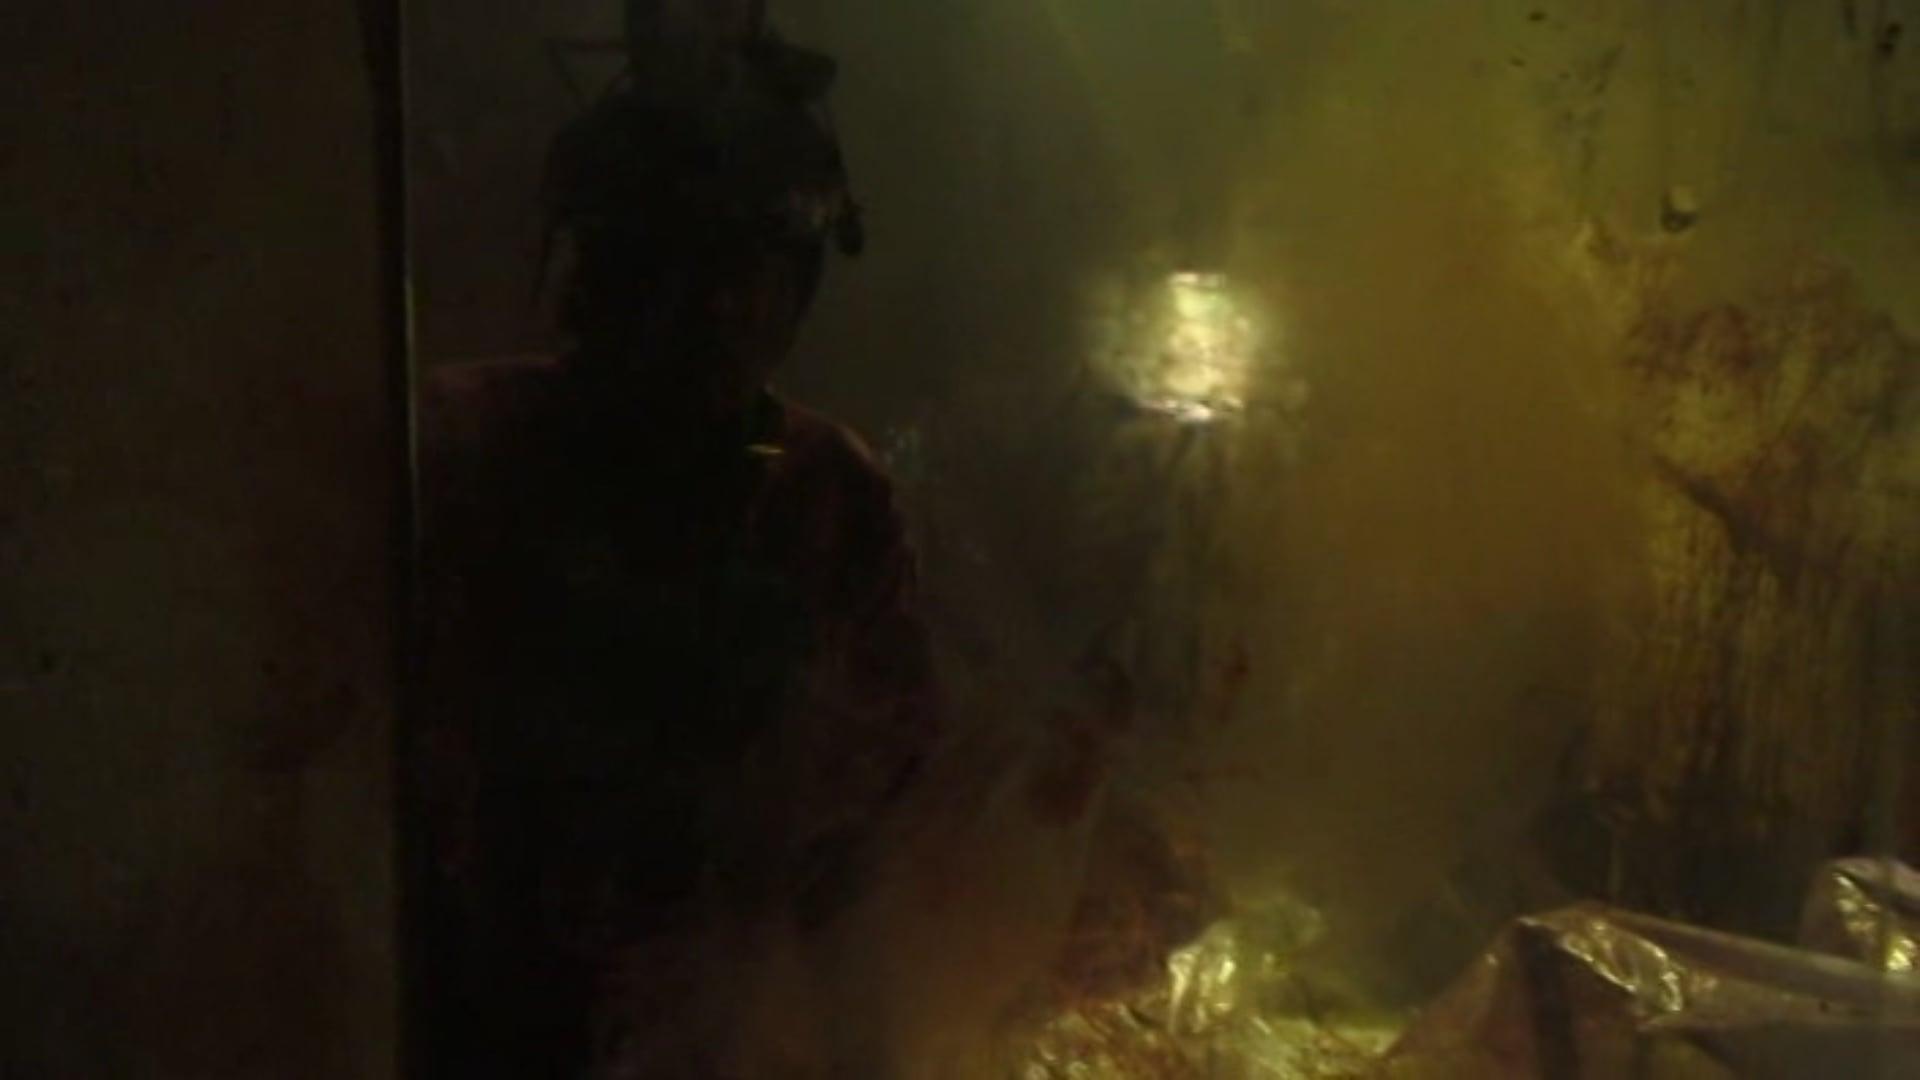 The Butcher (2008) tortured man